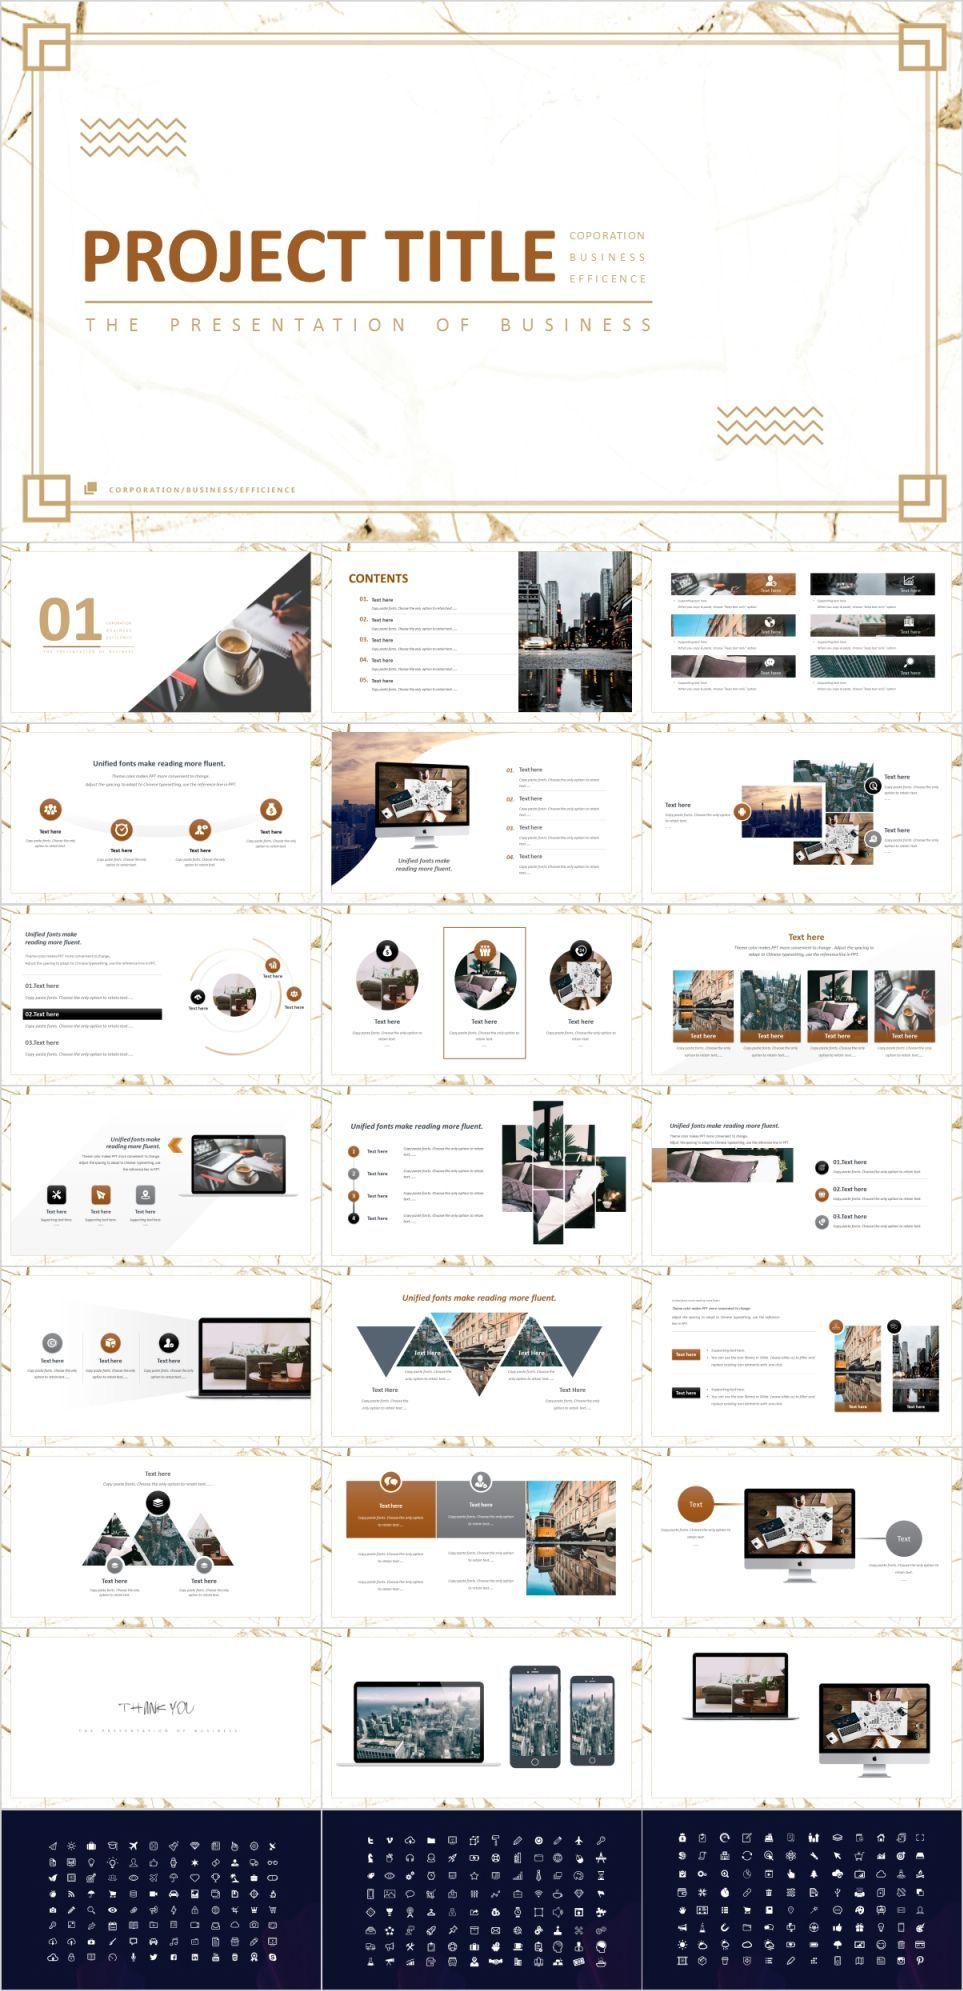 Business project design presentation Template - Pcslide com